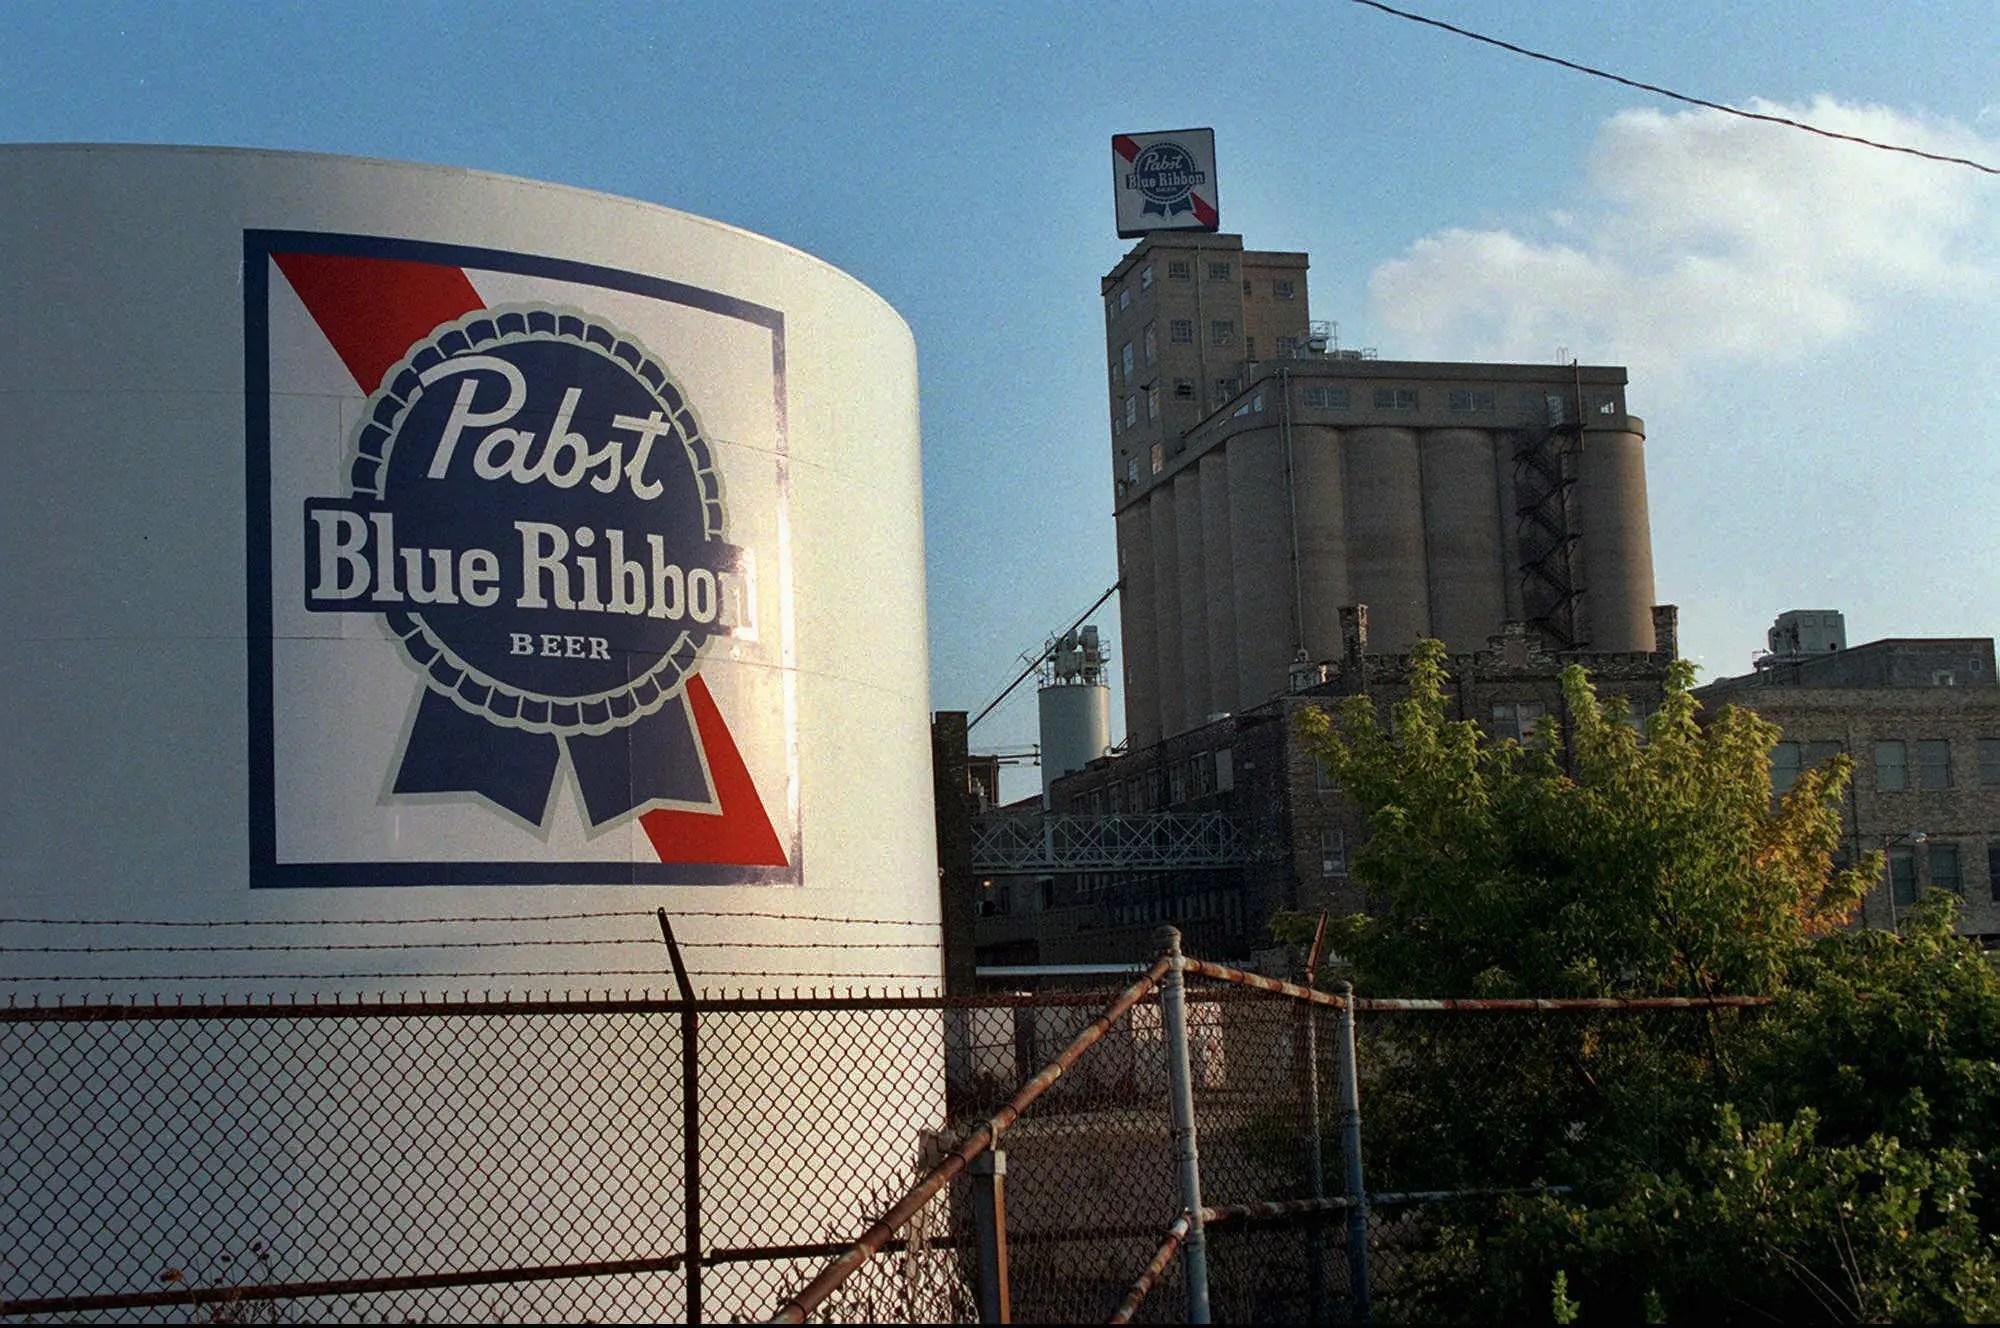 PBR Pabst Blue Ribbon